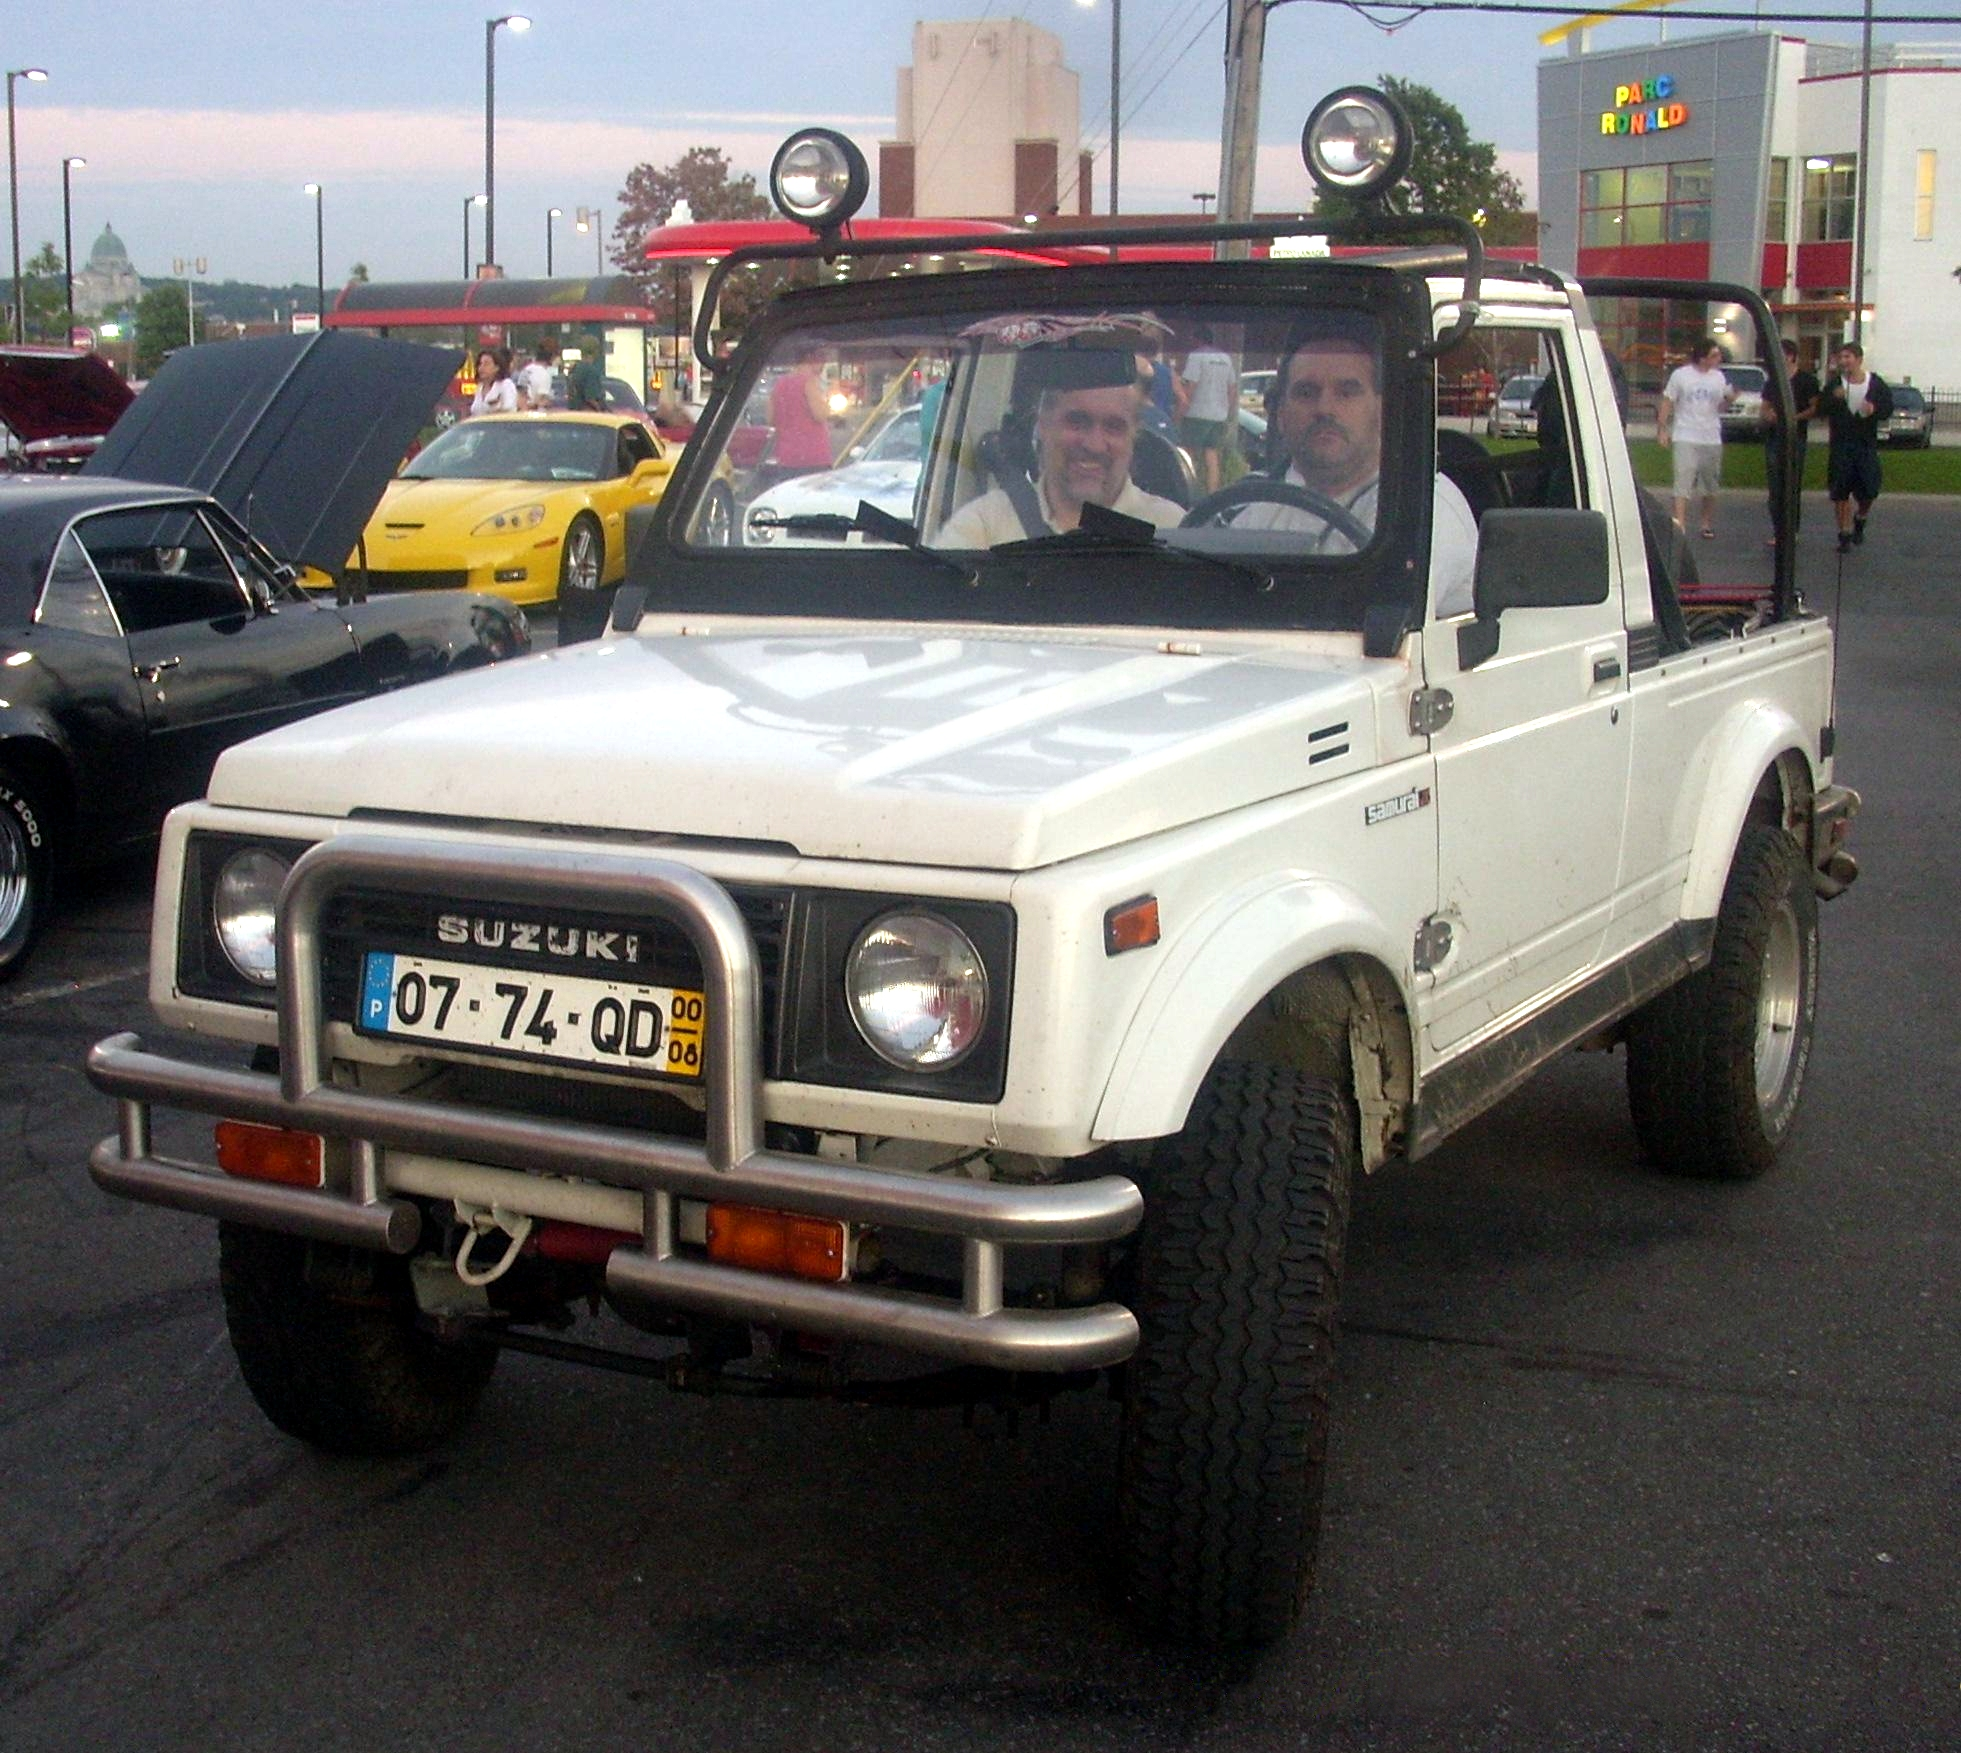 Suzuki Samurai instead of quad side by side vehicles convertible